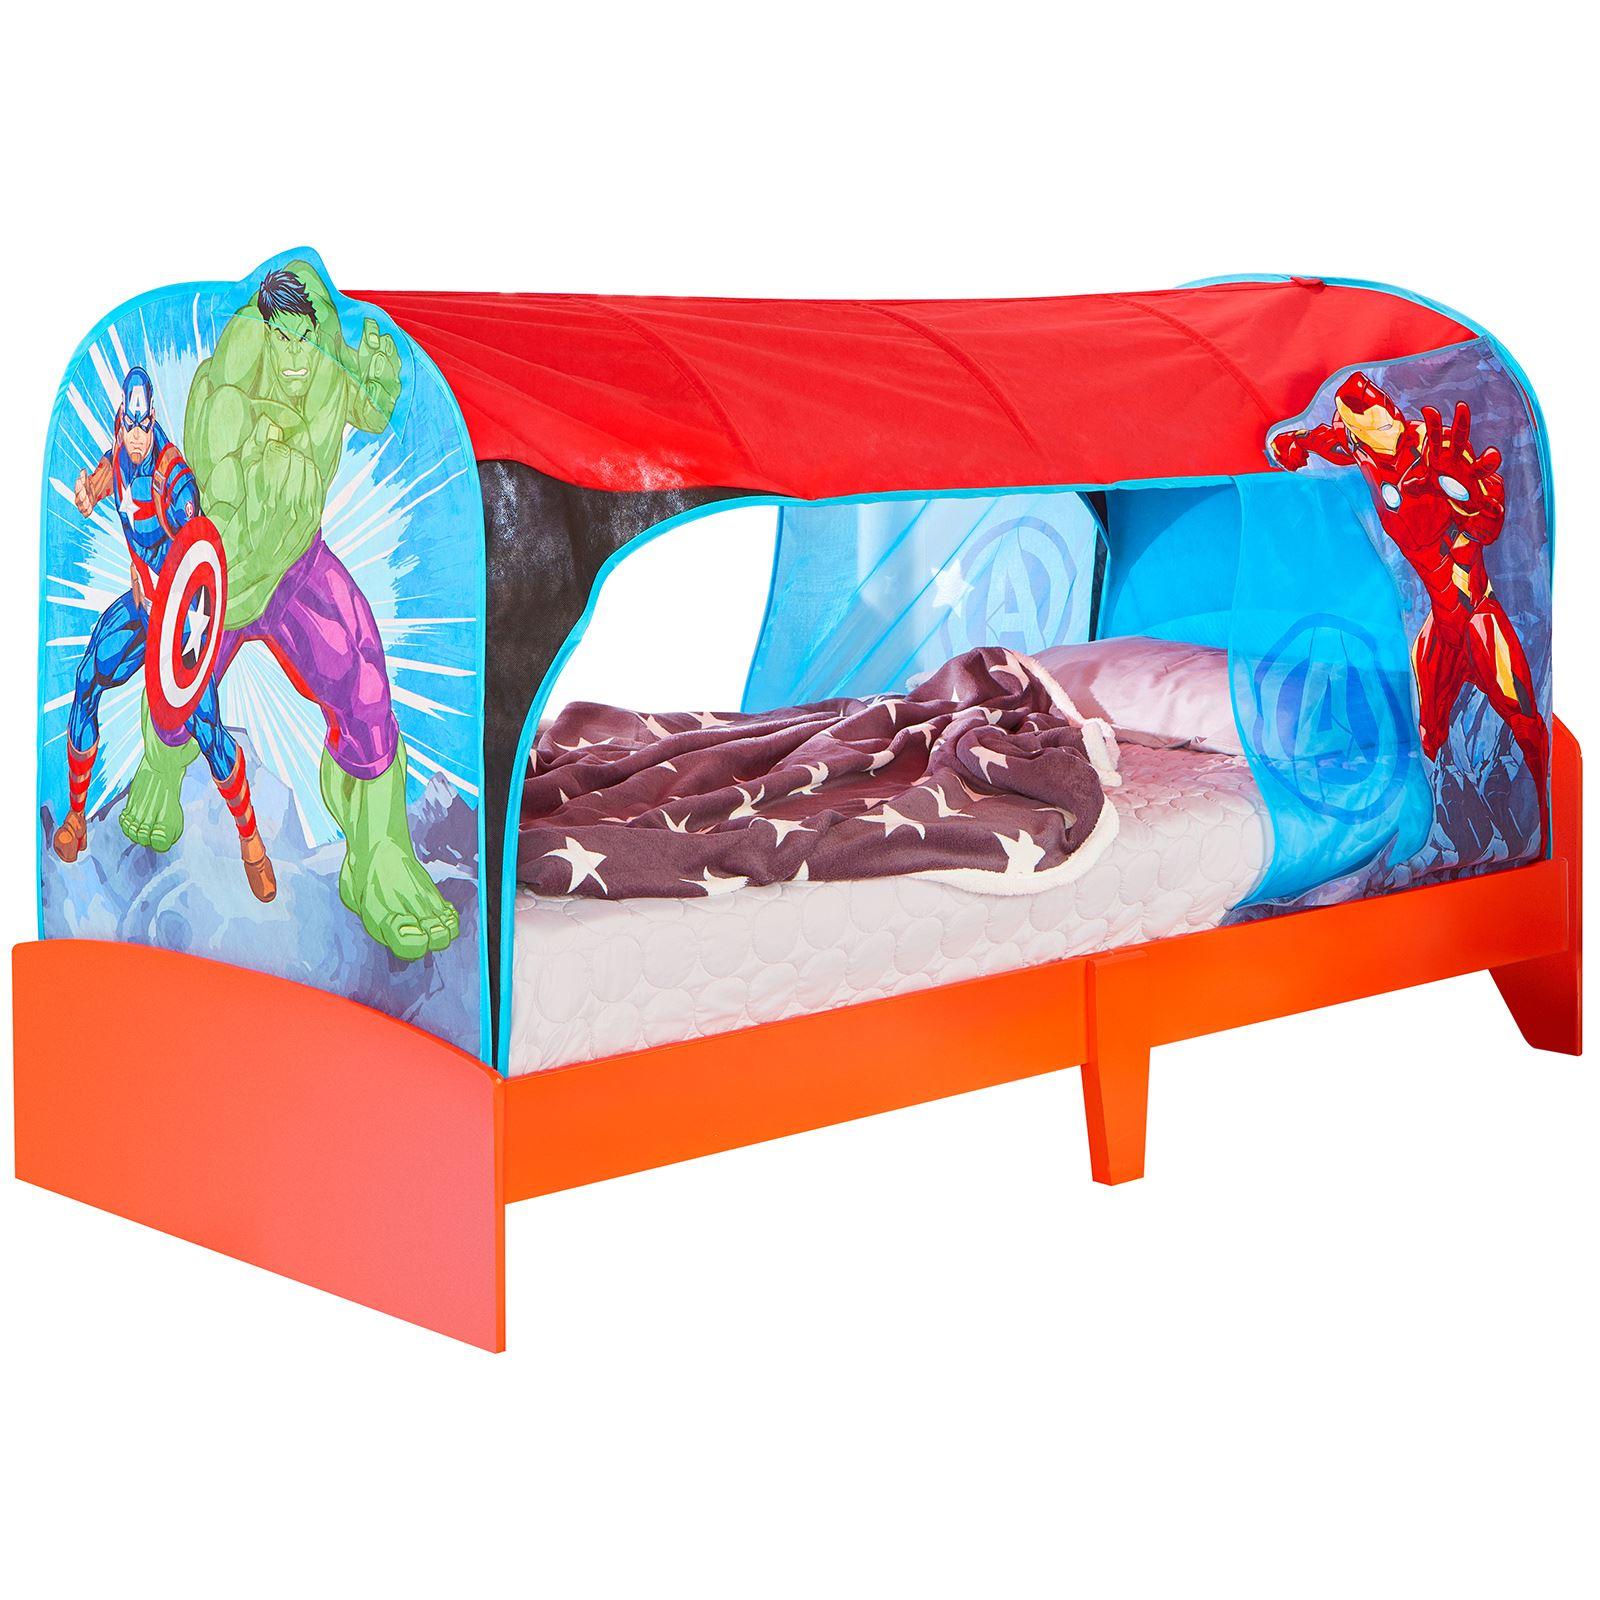 Mittelhoch Schlafer Uber Bett Bett Zelten Kinder Jungen